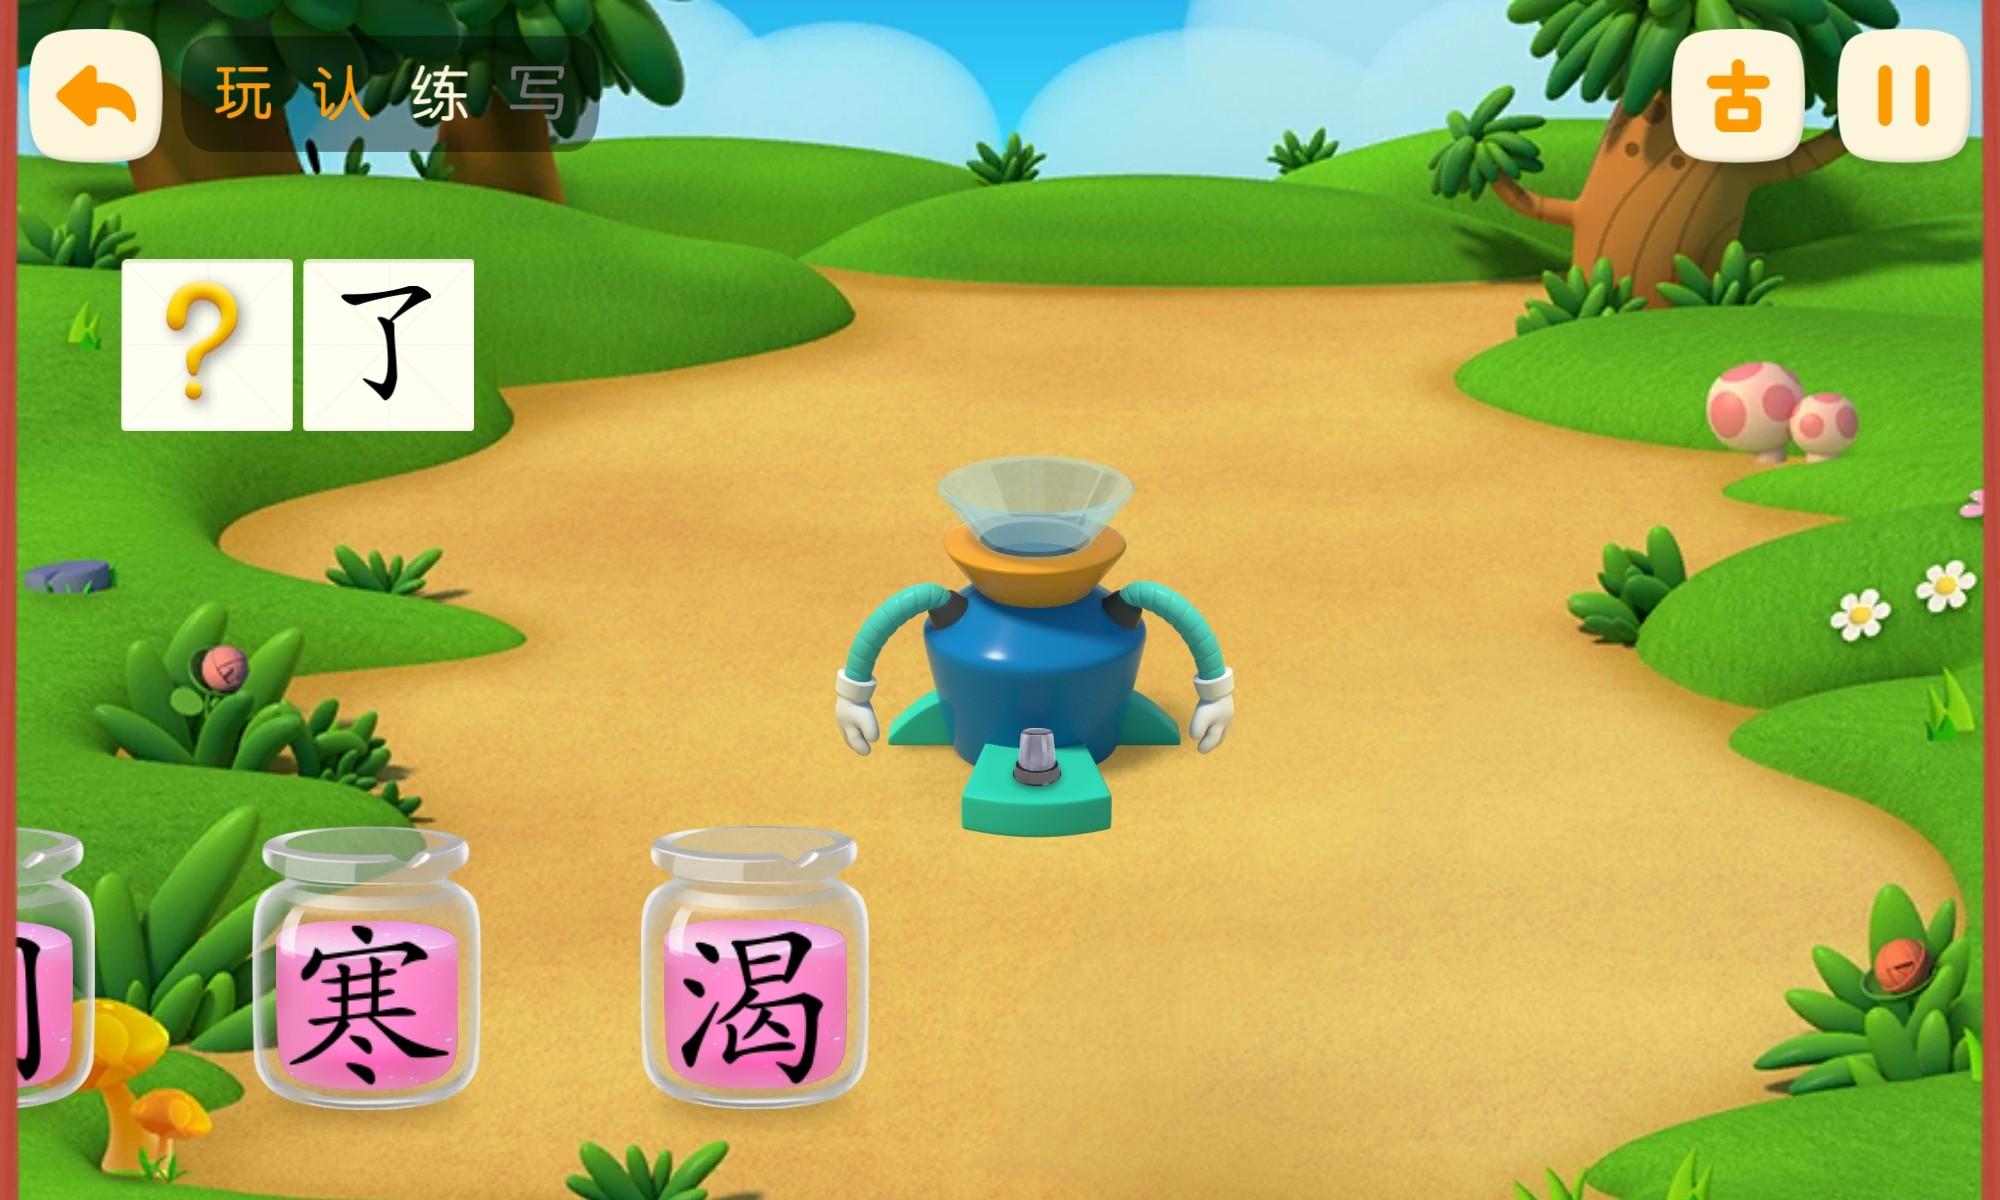 Screenshot_20200509_160548_com.hongen.app.word.jpg